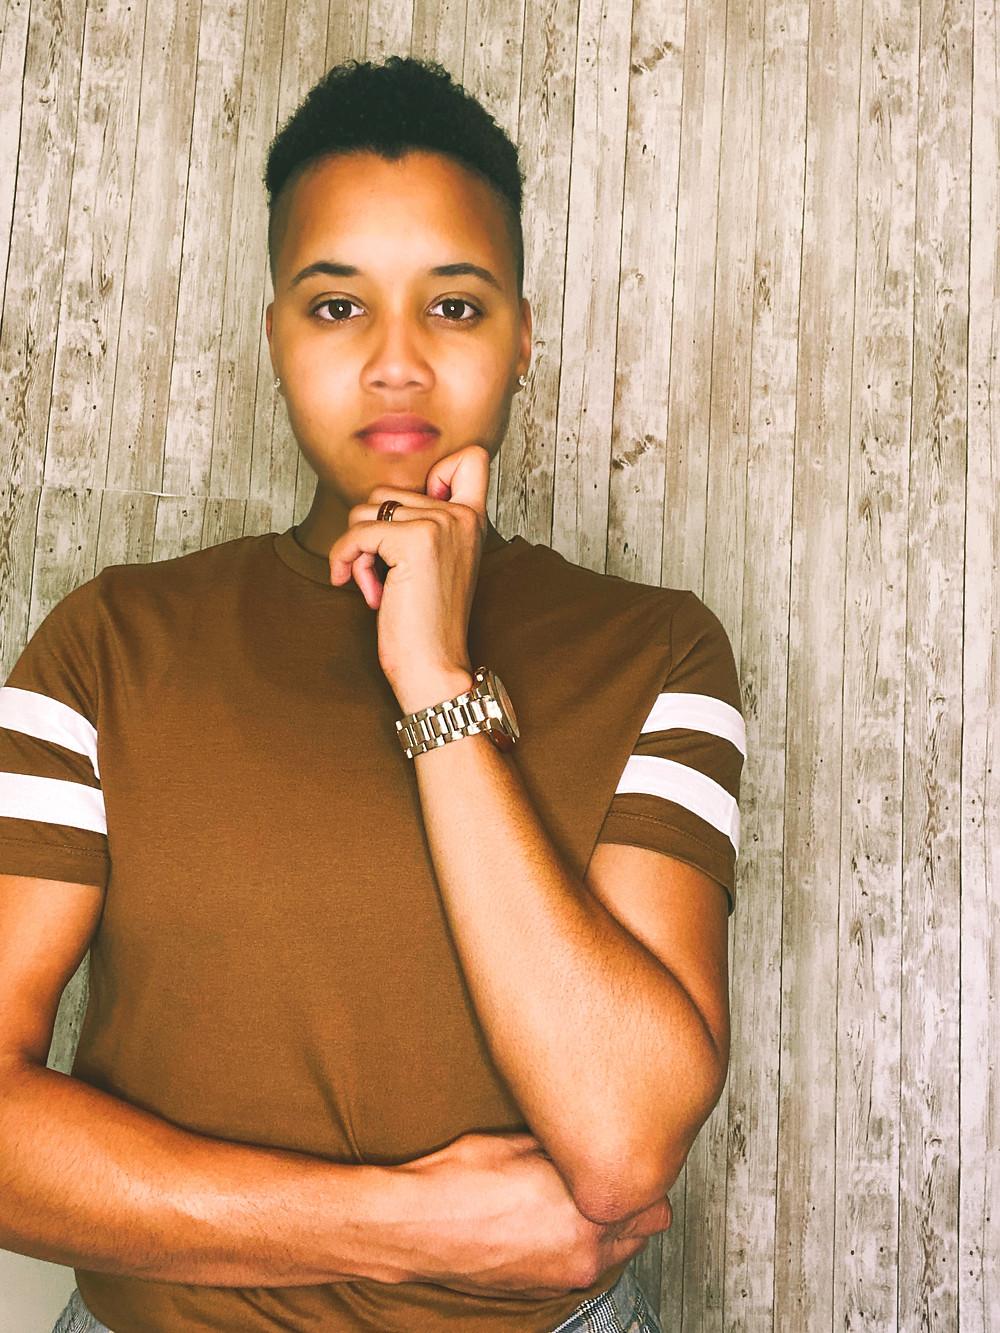 Feature educator and writer azuree harrison